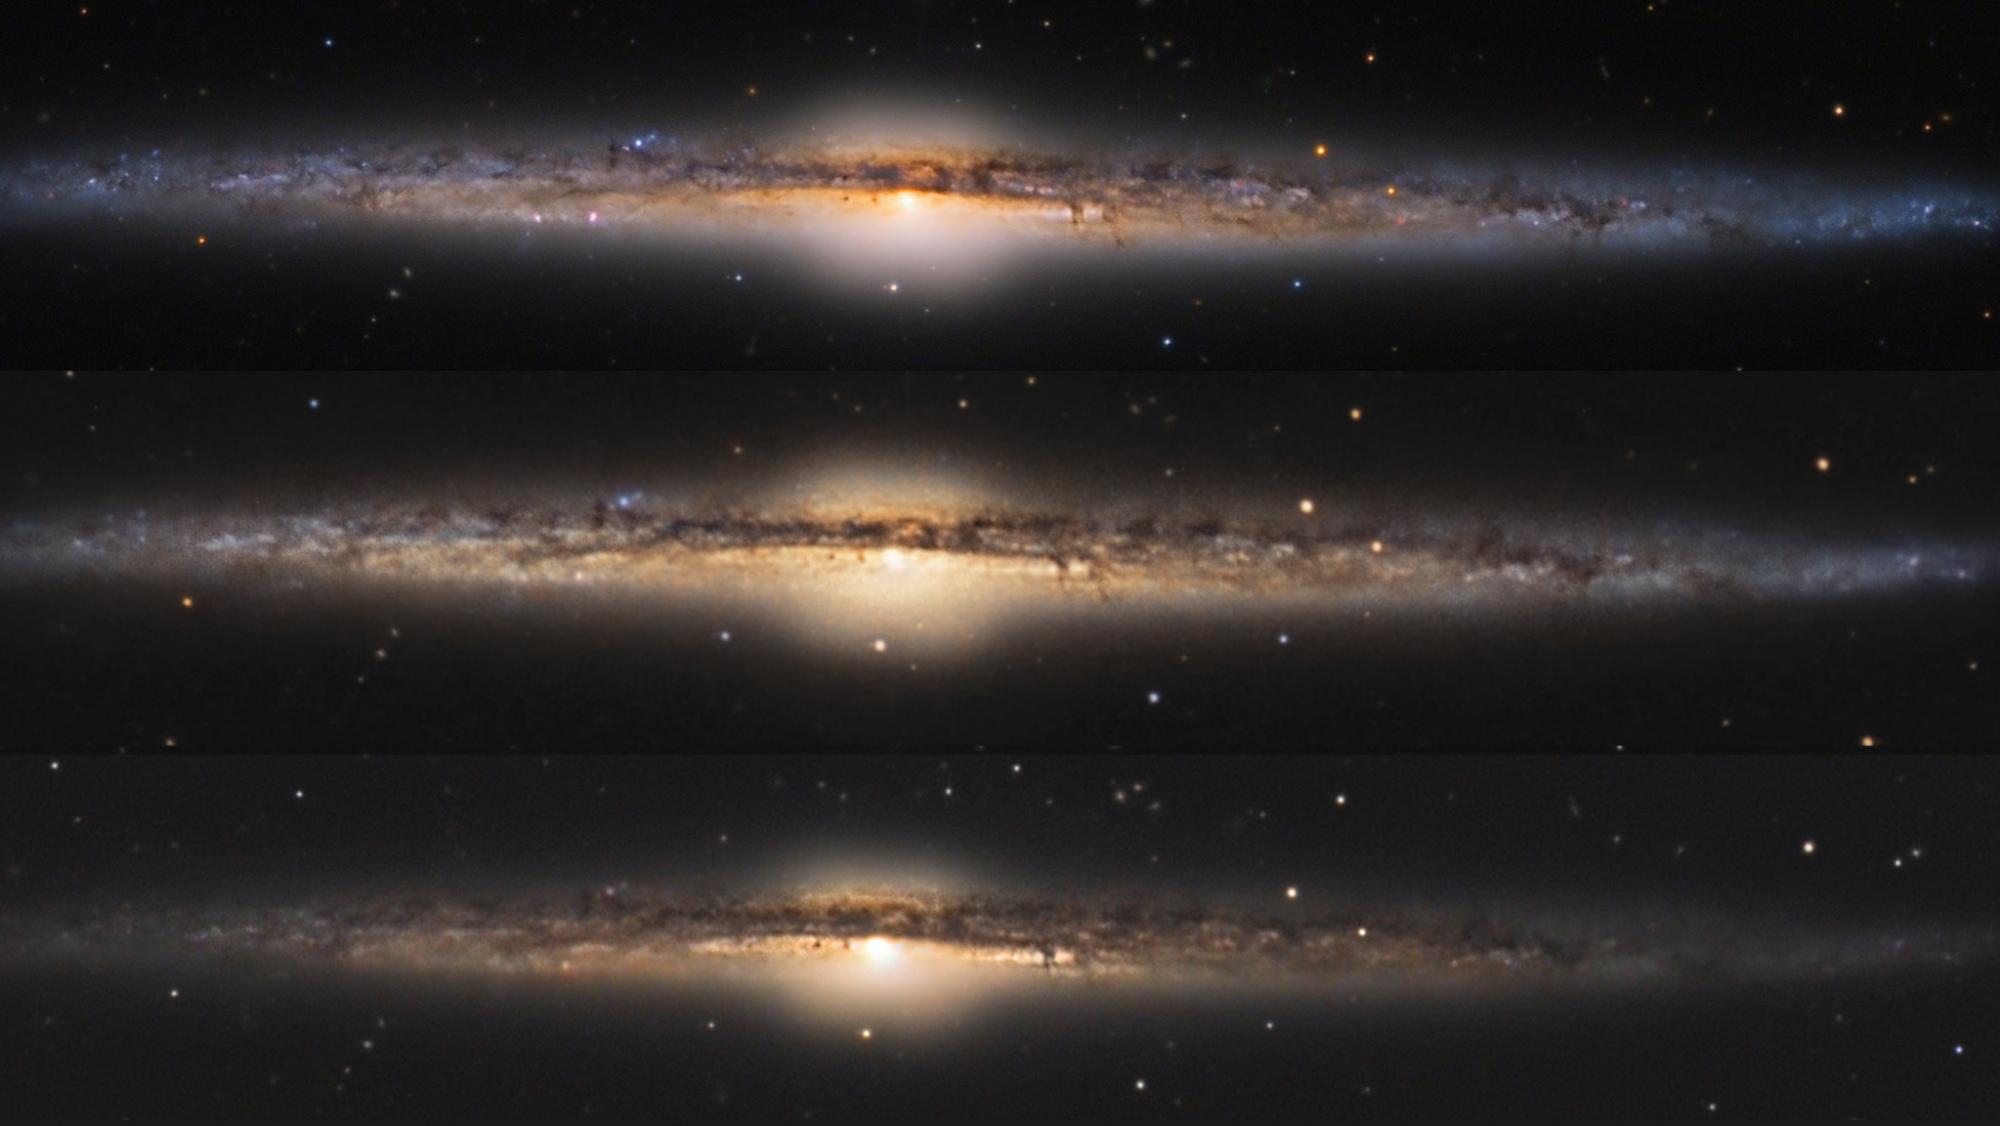 NGC-4565-compa_web.thumb.jpg.99d6d2a205e93942f4065c8cb5e1292d.jpg